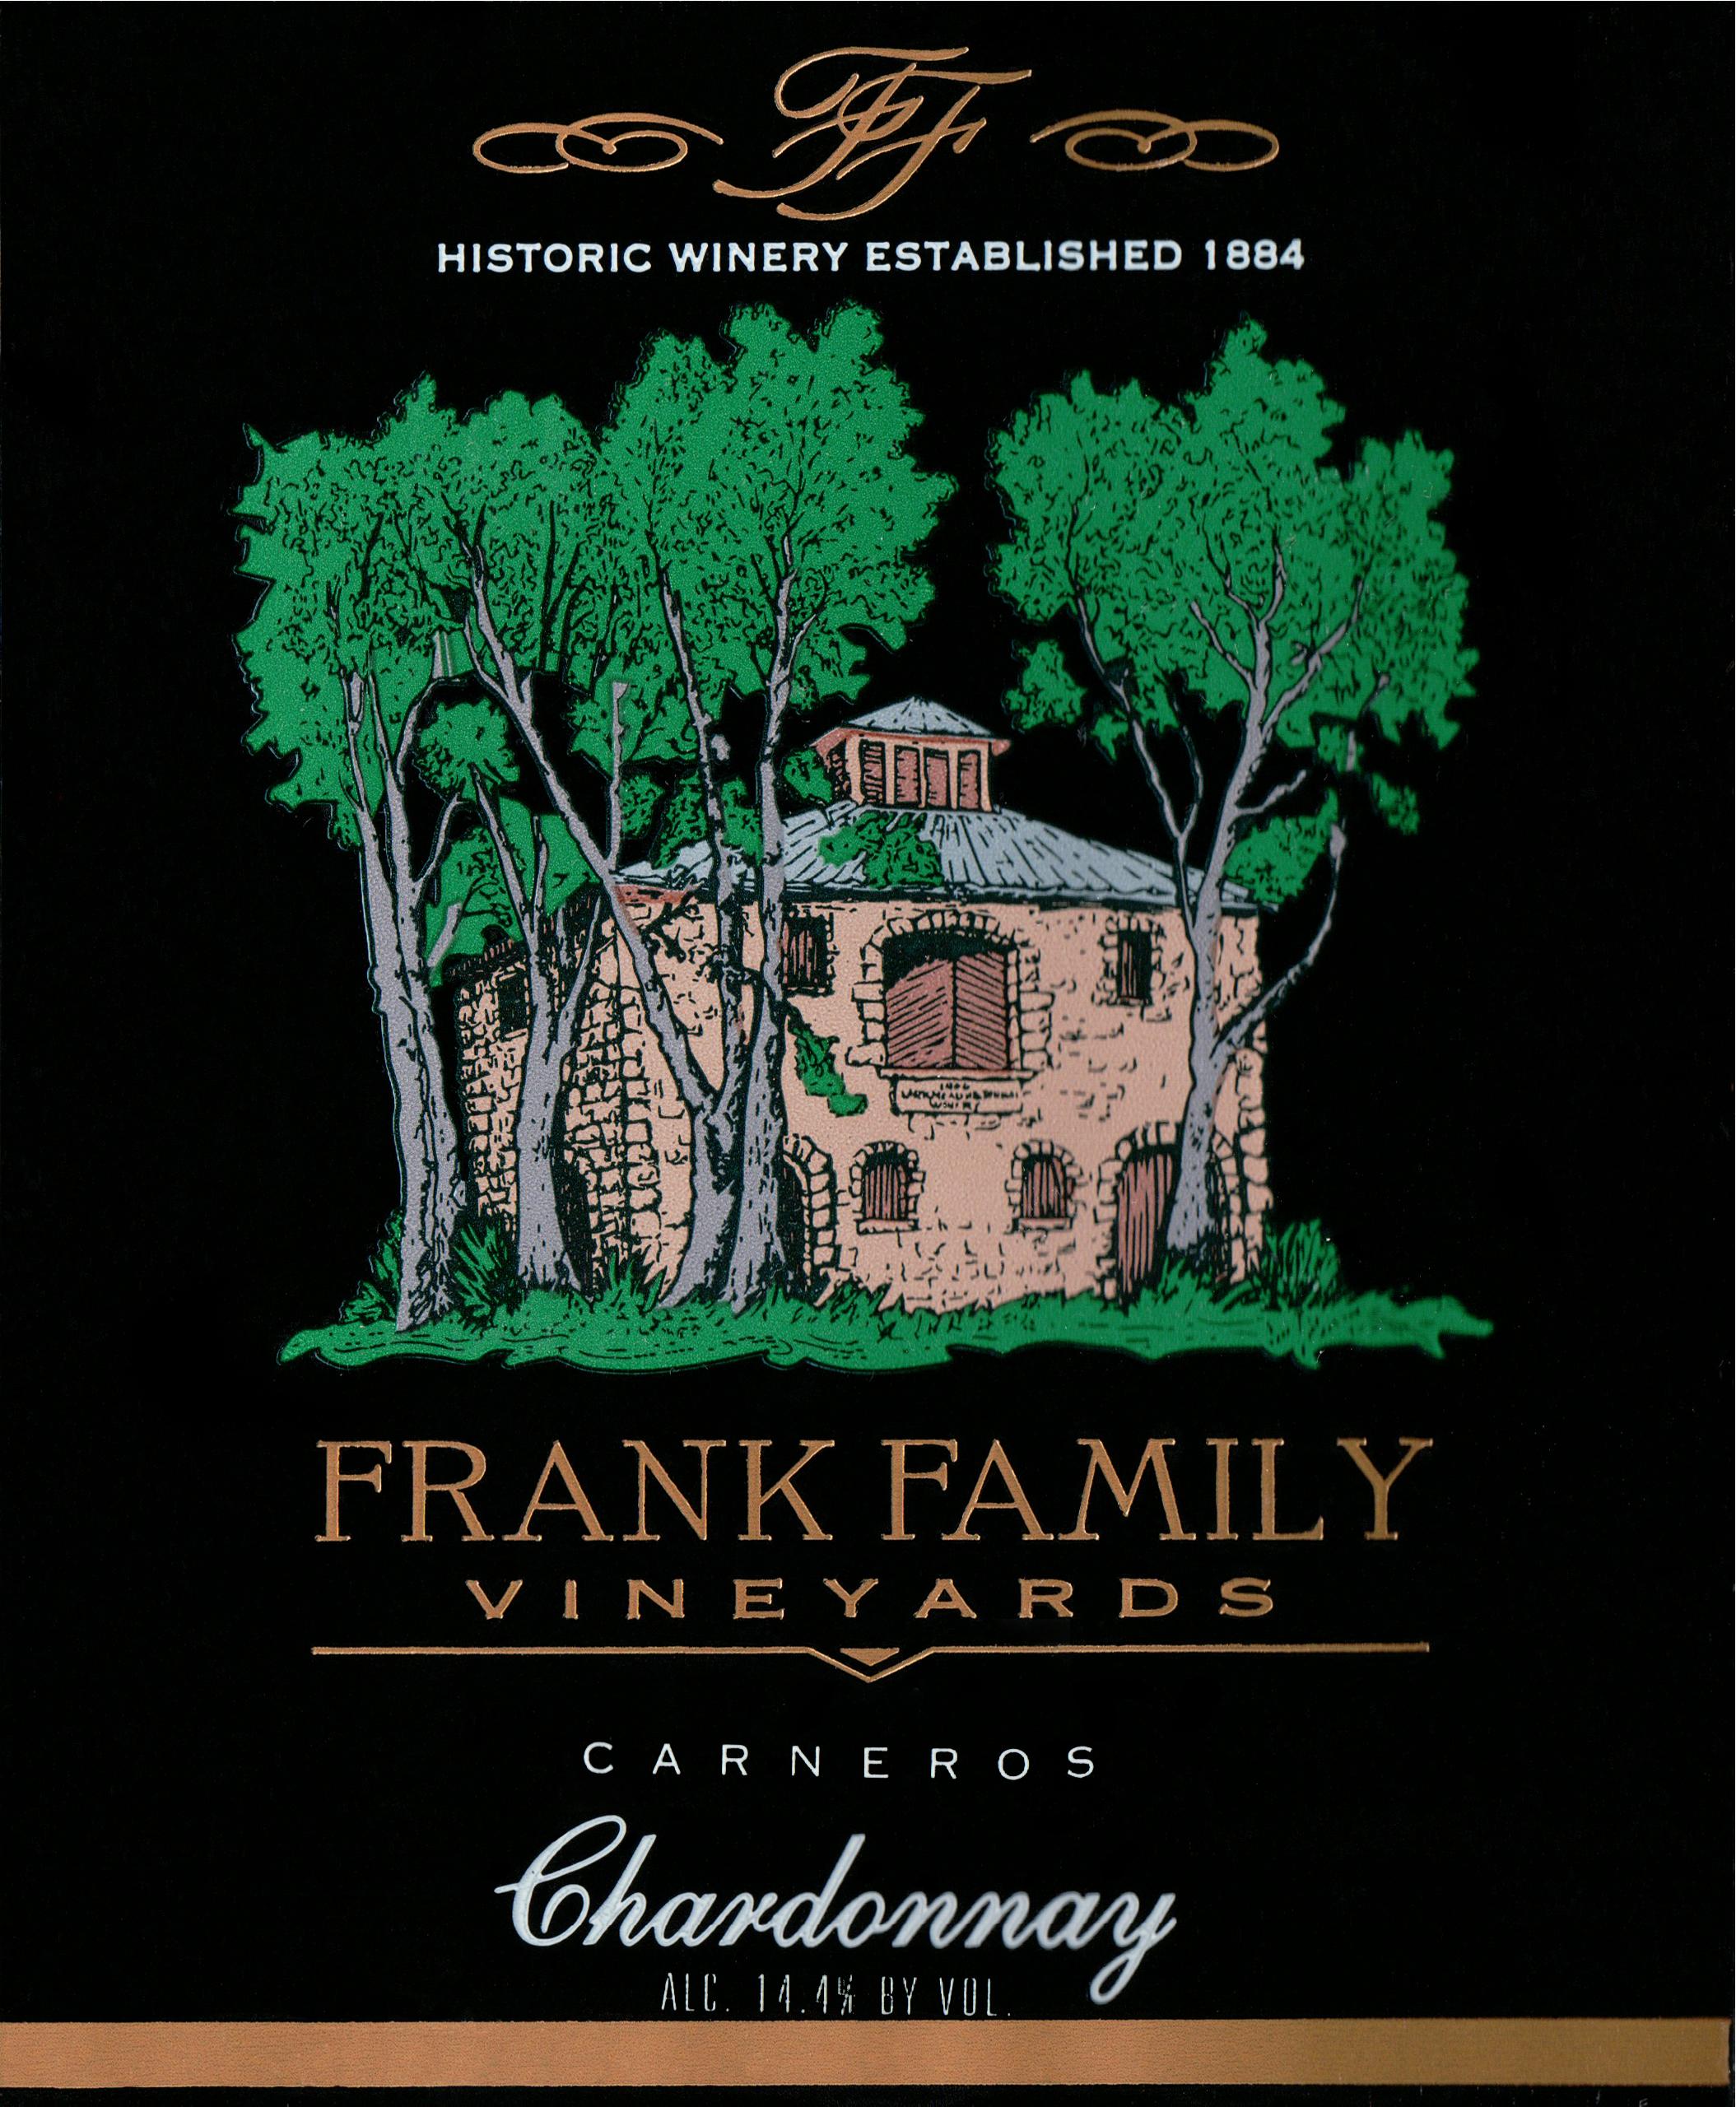 Frank Family Chardonnay 2018